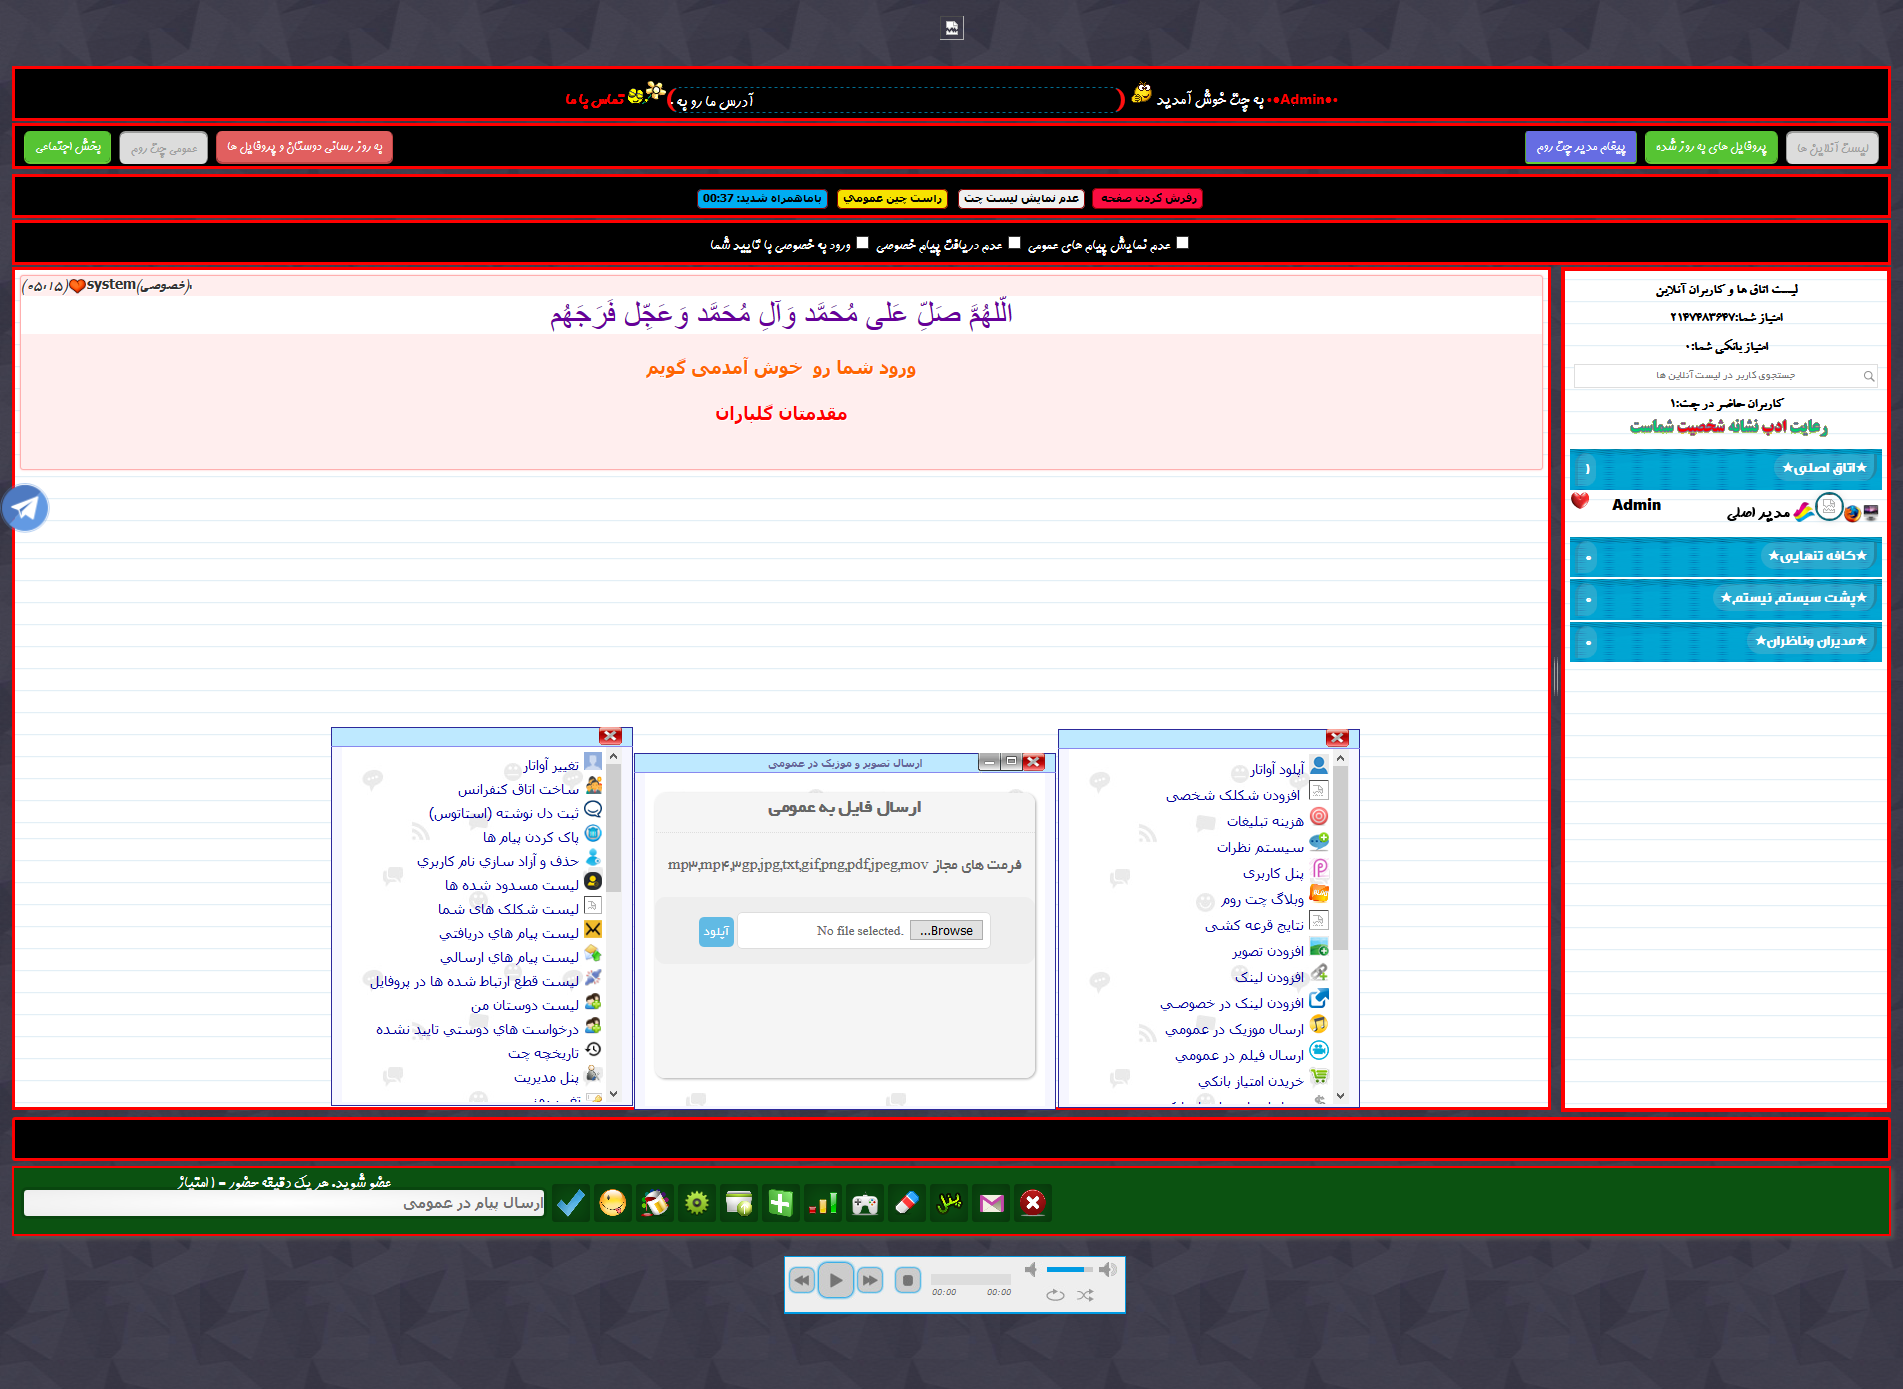 http://s8.picofile.com/file/8361241084/golrizweb_ir_9.png